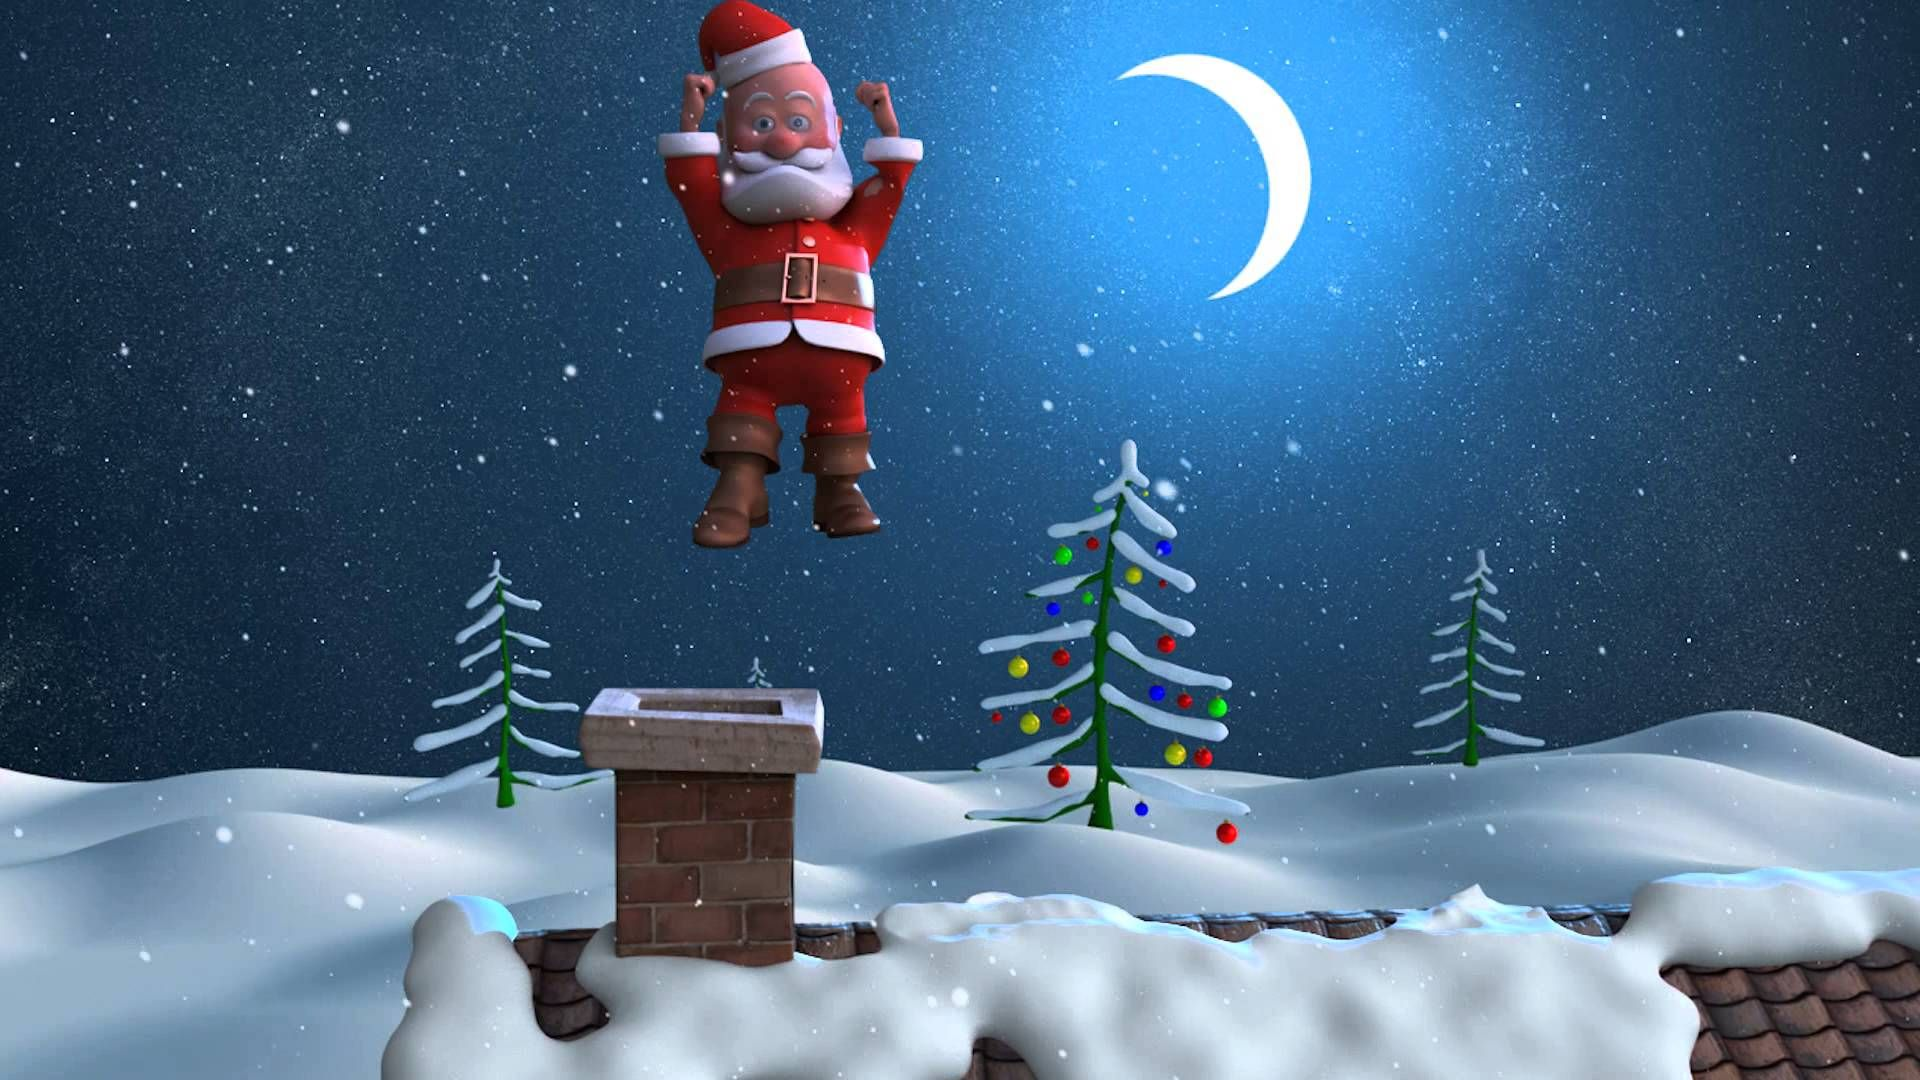 Divertente Video Natale Christmas Video Animation By Arcapelshop Com Merry Christmas Gif Christmas Gif London Christmas